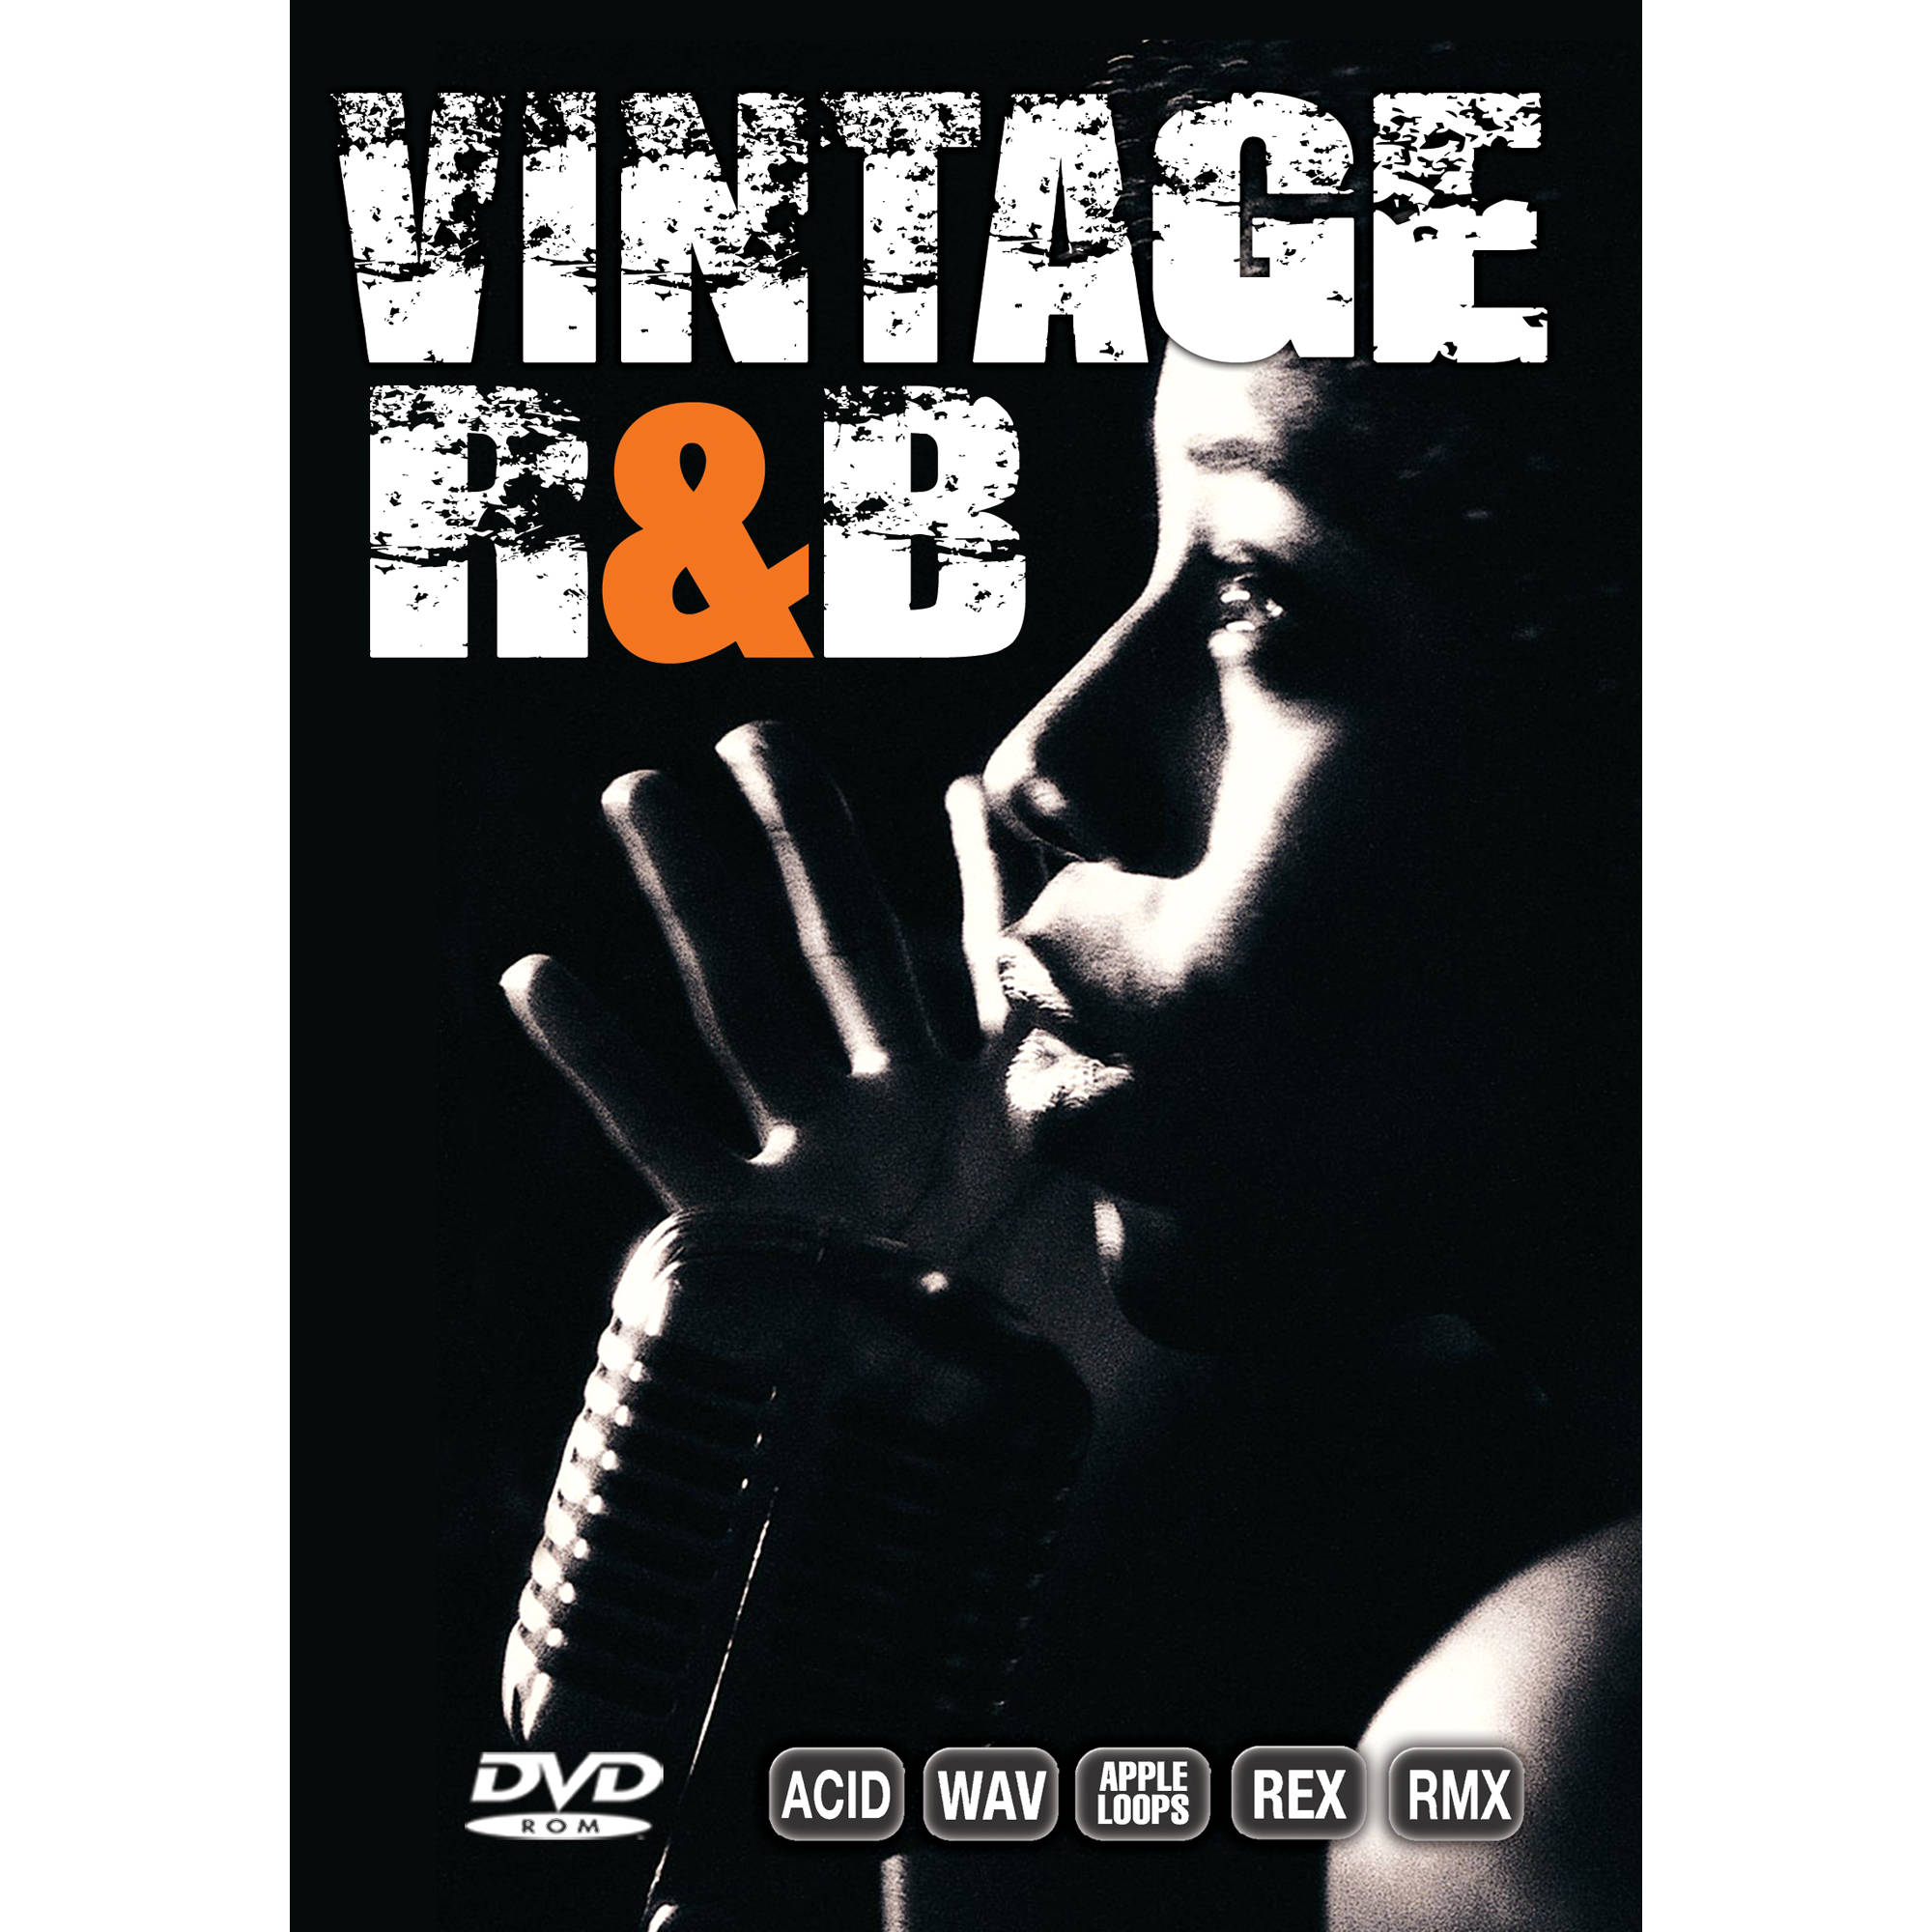 Big fish audio vintage r b dvd vnrb1 orwx b h photo video for Big fish audio